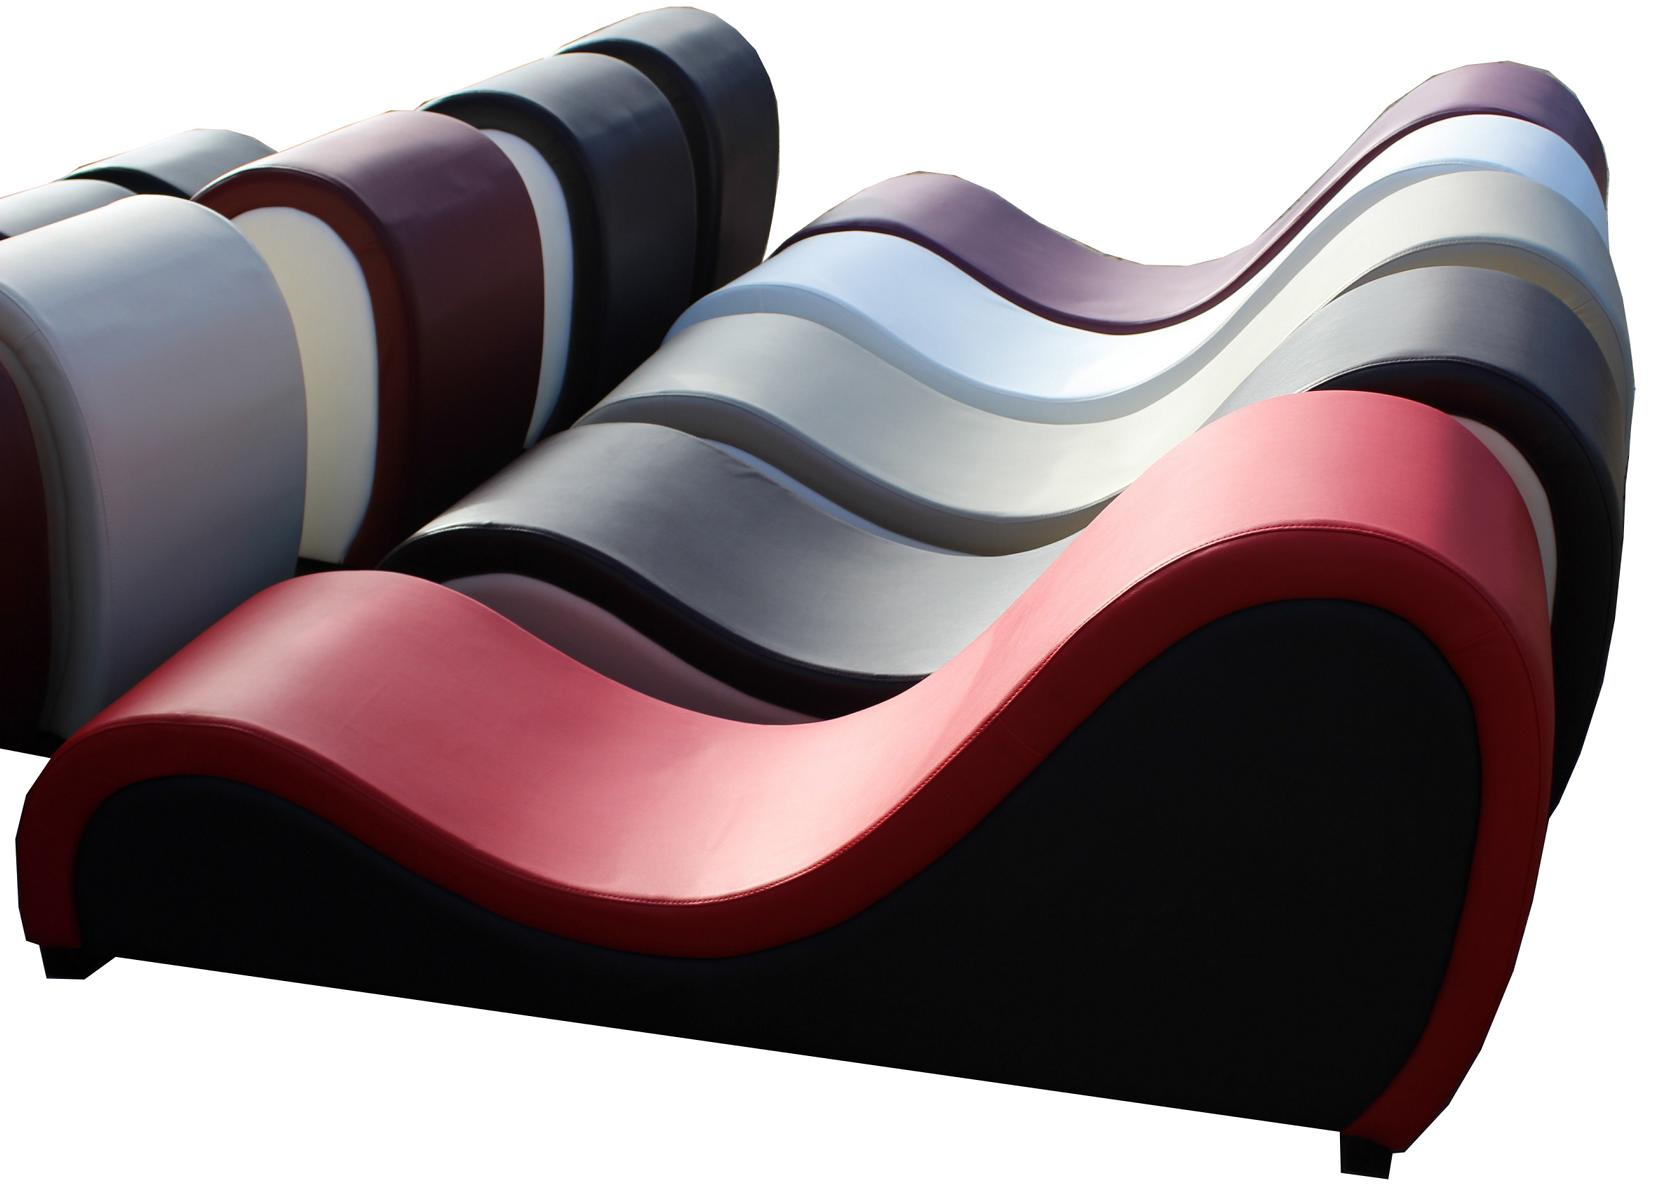 Tantra Sofa Kamasutra Relax Sex Chair Stuhl Liege Sessel